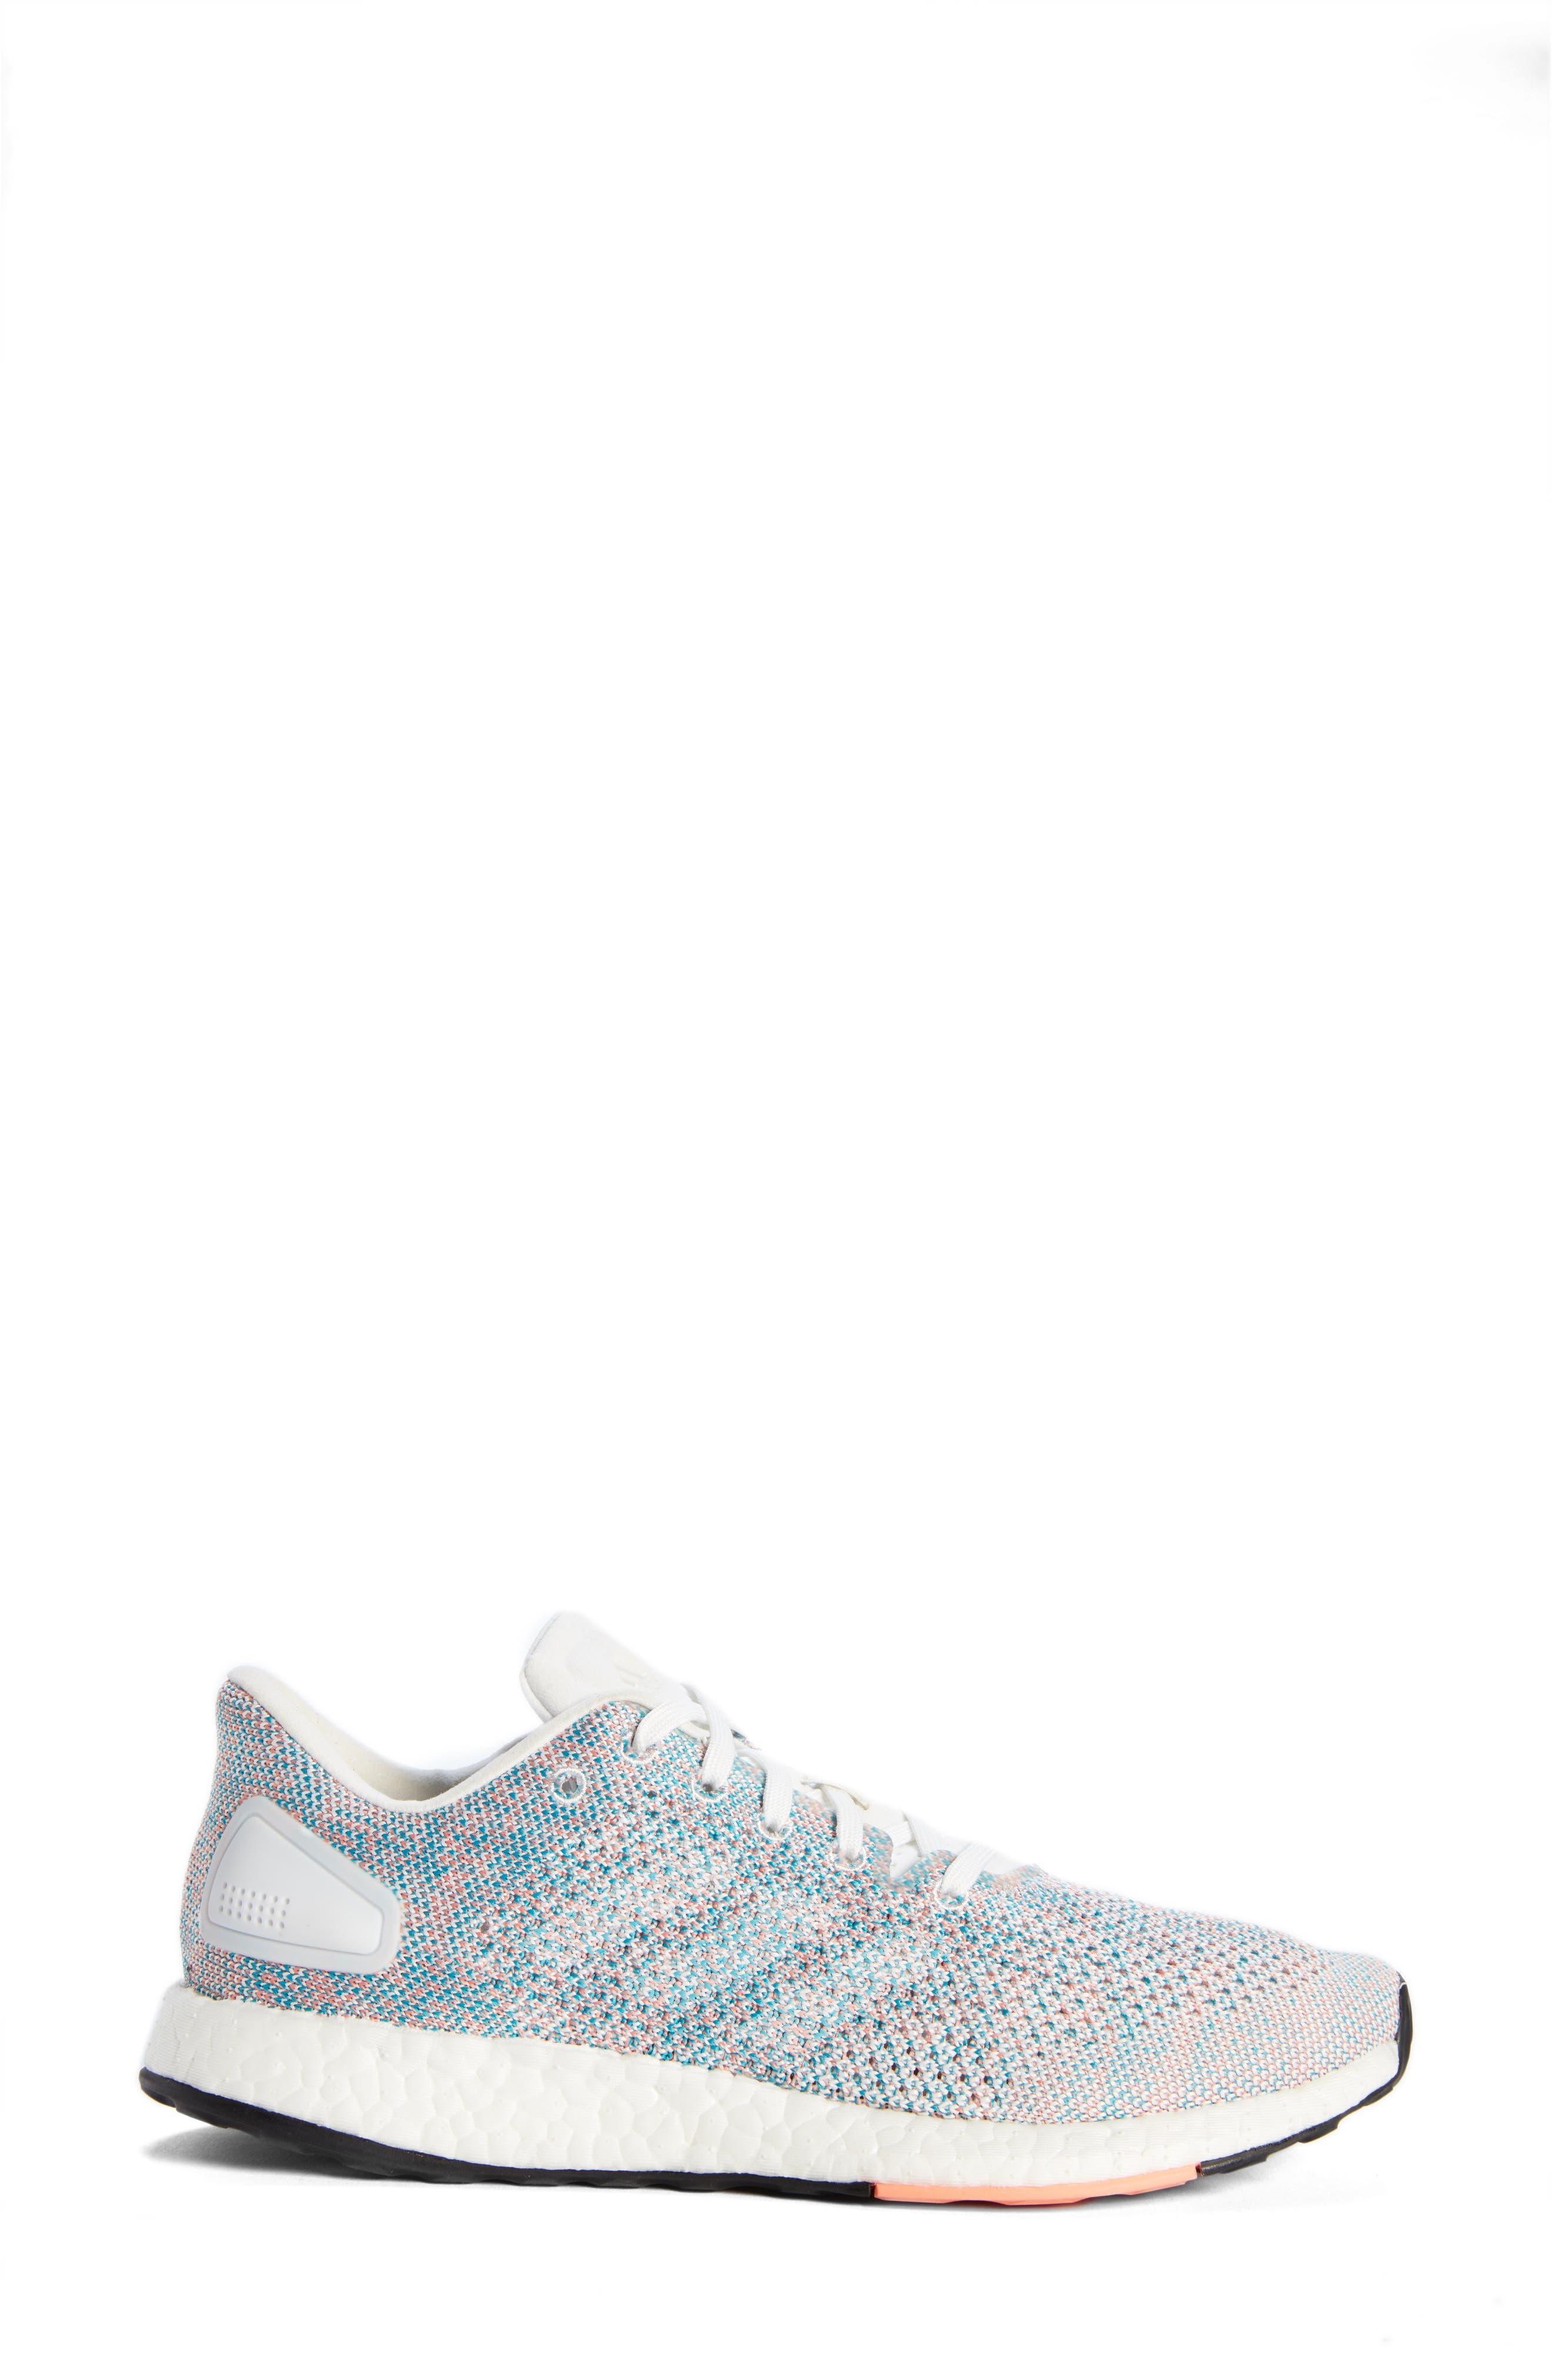 PureBoost DPR Running Shoe,                             Alternate thumbnail 3, color,                             100